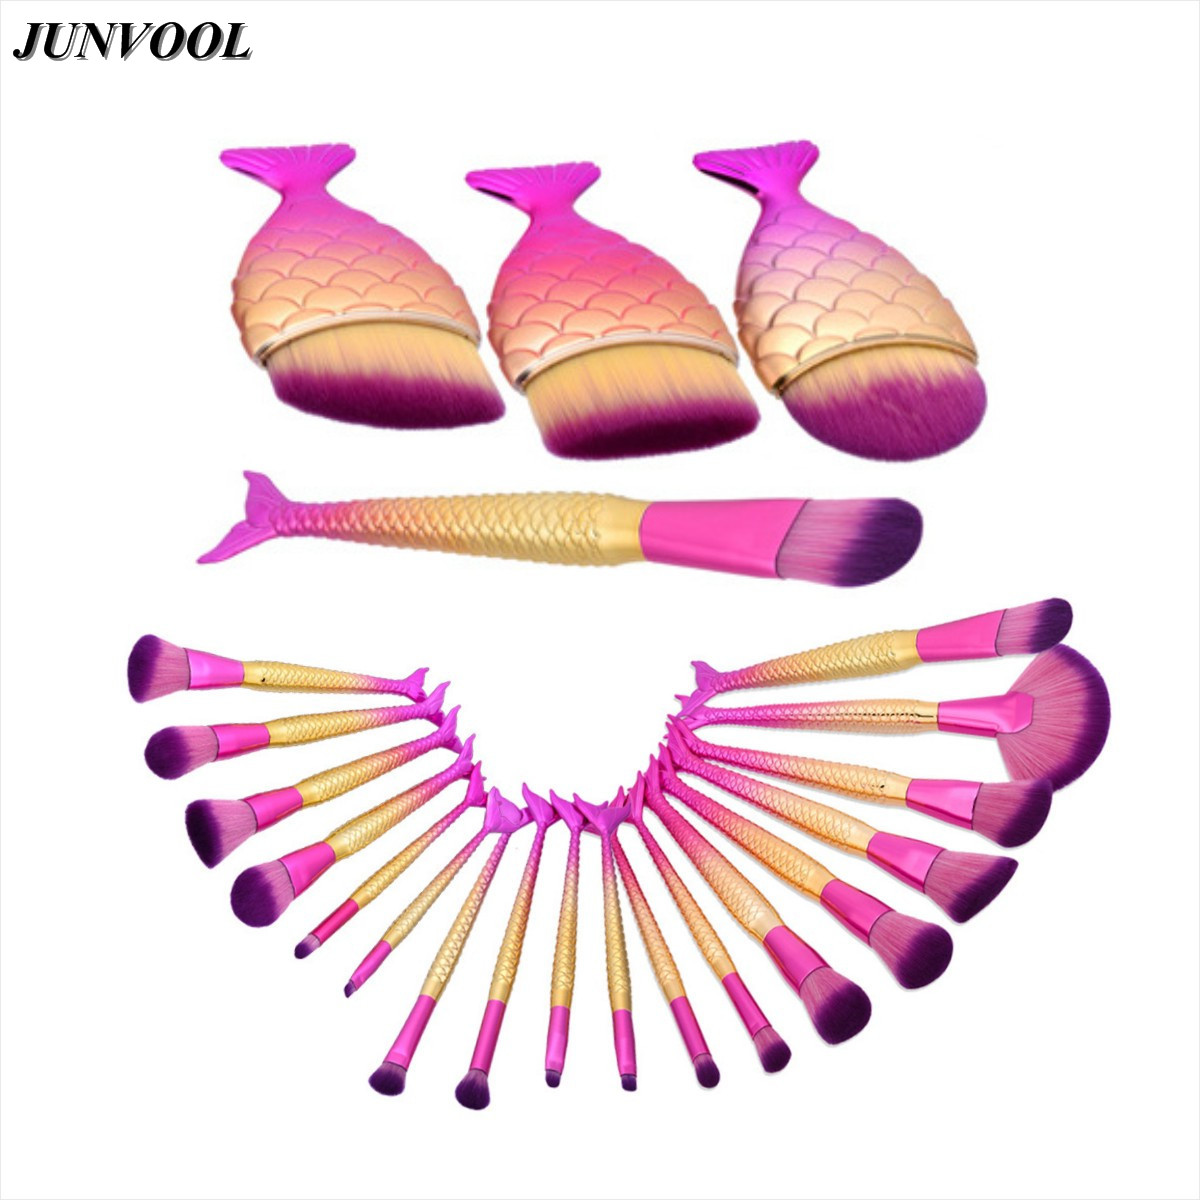 Pro Fish Tail Makeup Brushes Set Mermaid Foundation Blending Powder Eyeshadow Contour Fan Brush Comestic Beauty Make Up Kit Pink